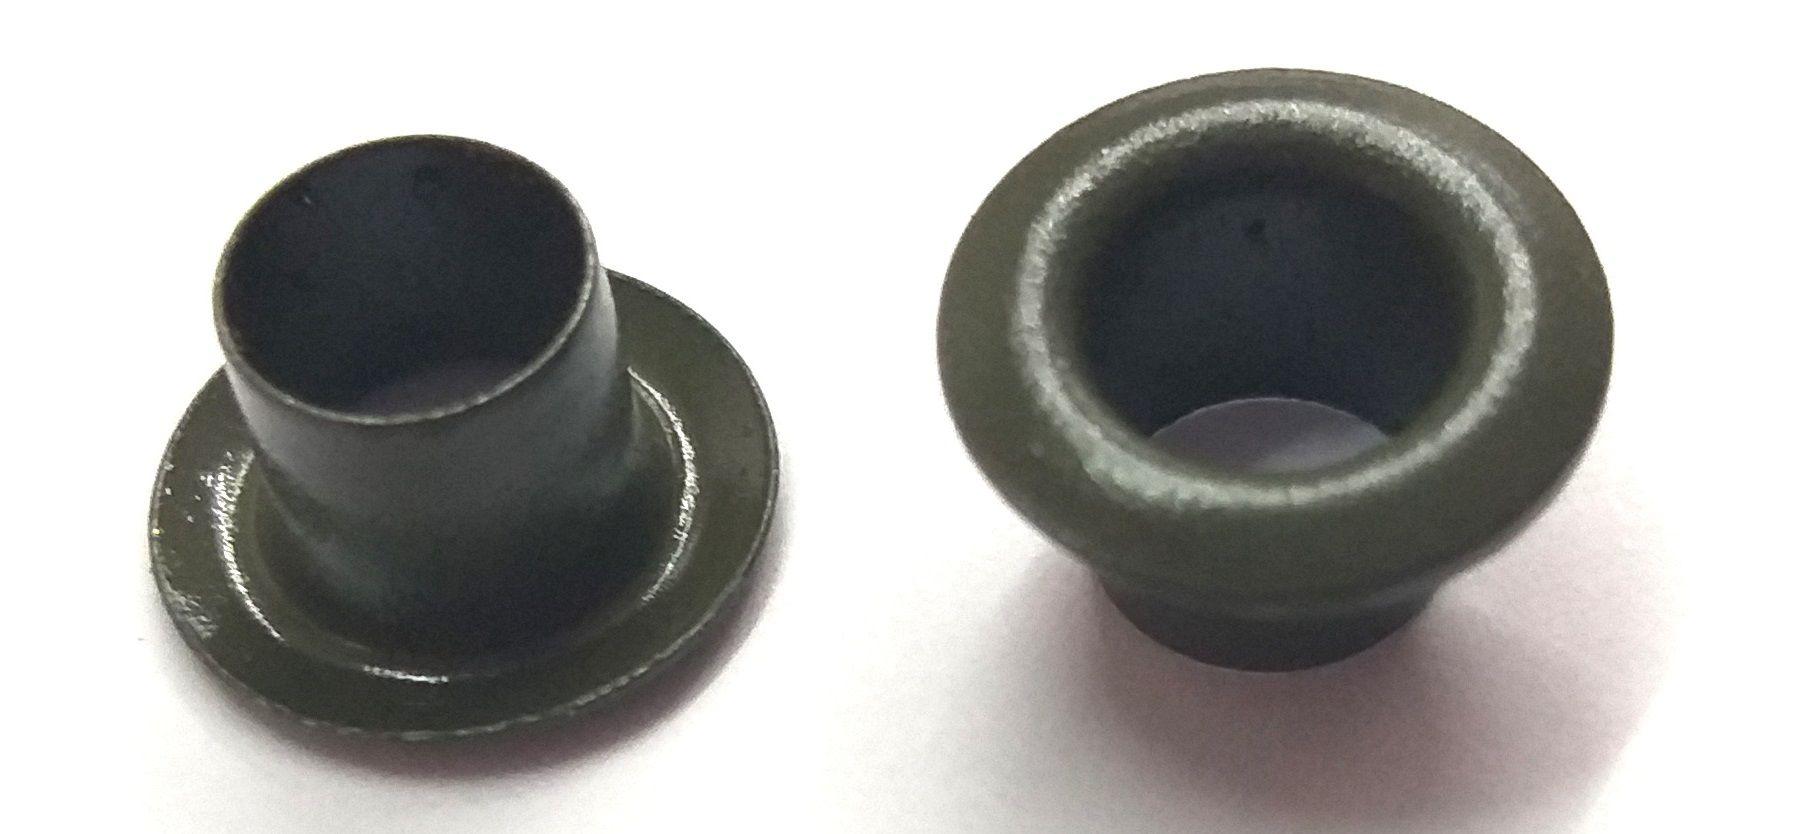 Ilhós sem Arruela Ferro Nº 50 - 11mm de diâmetro externo - Diversas Cores